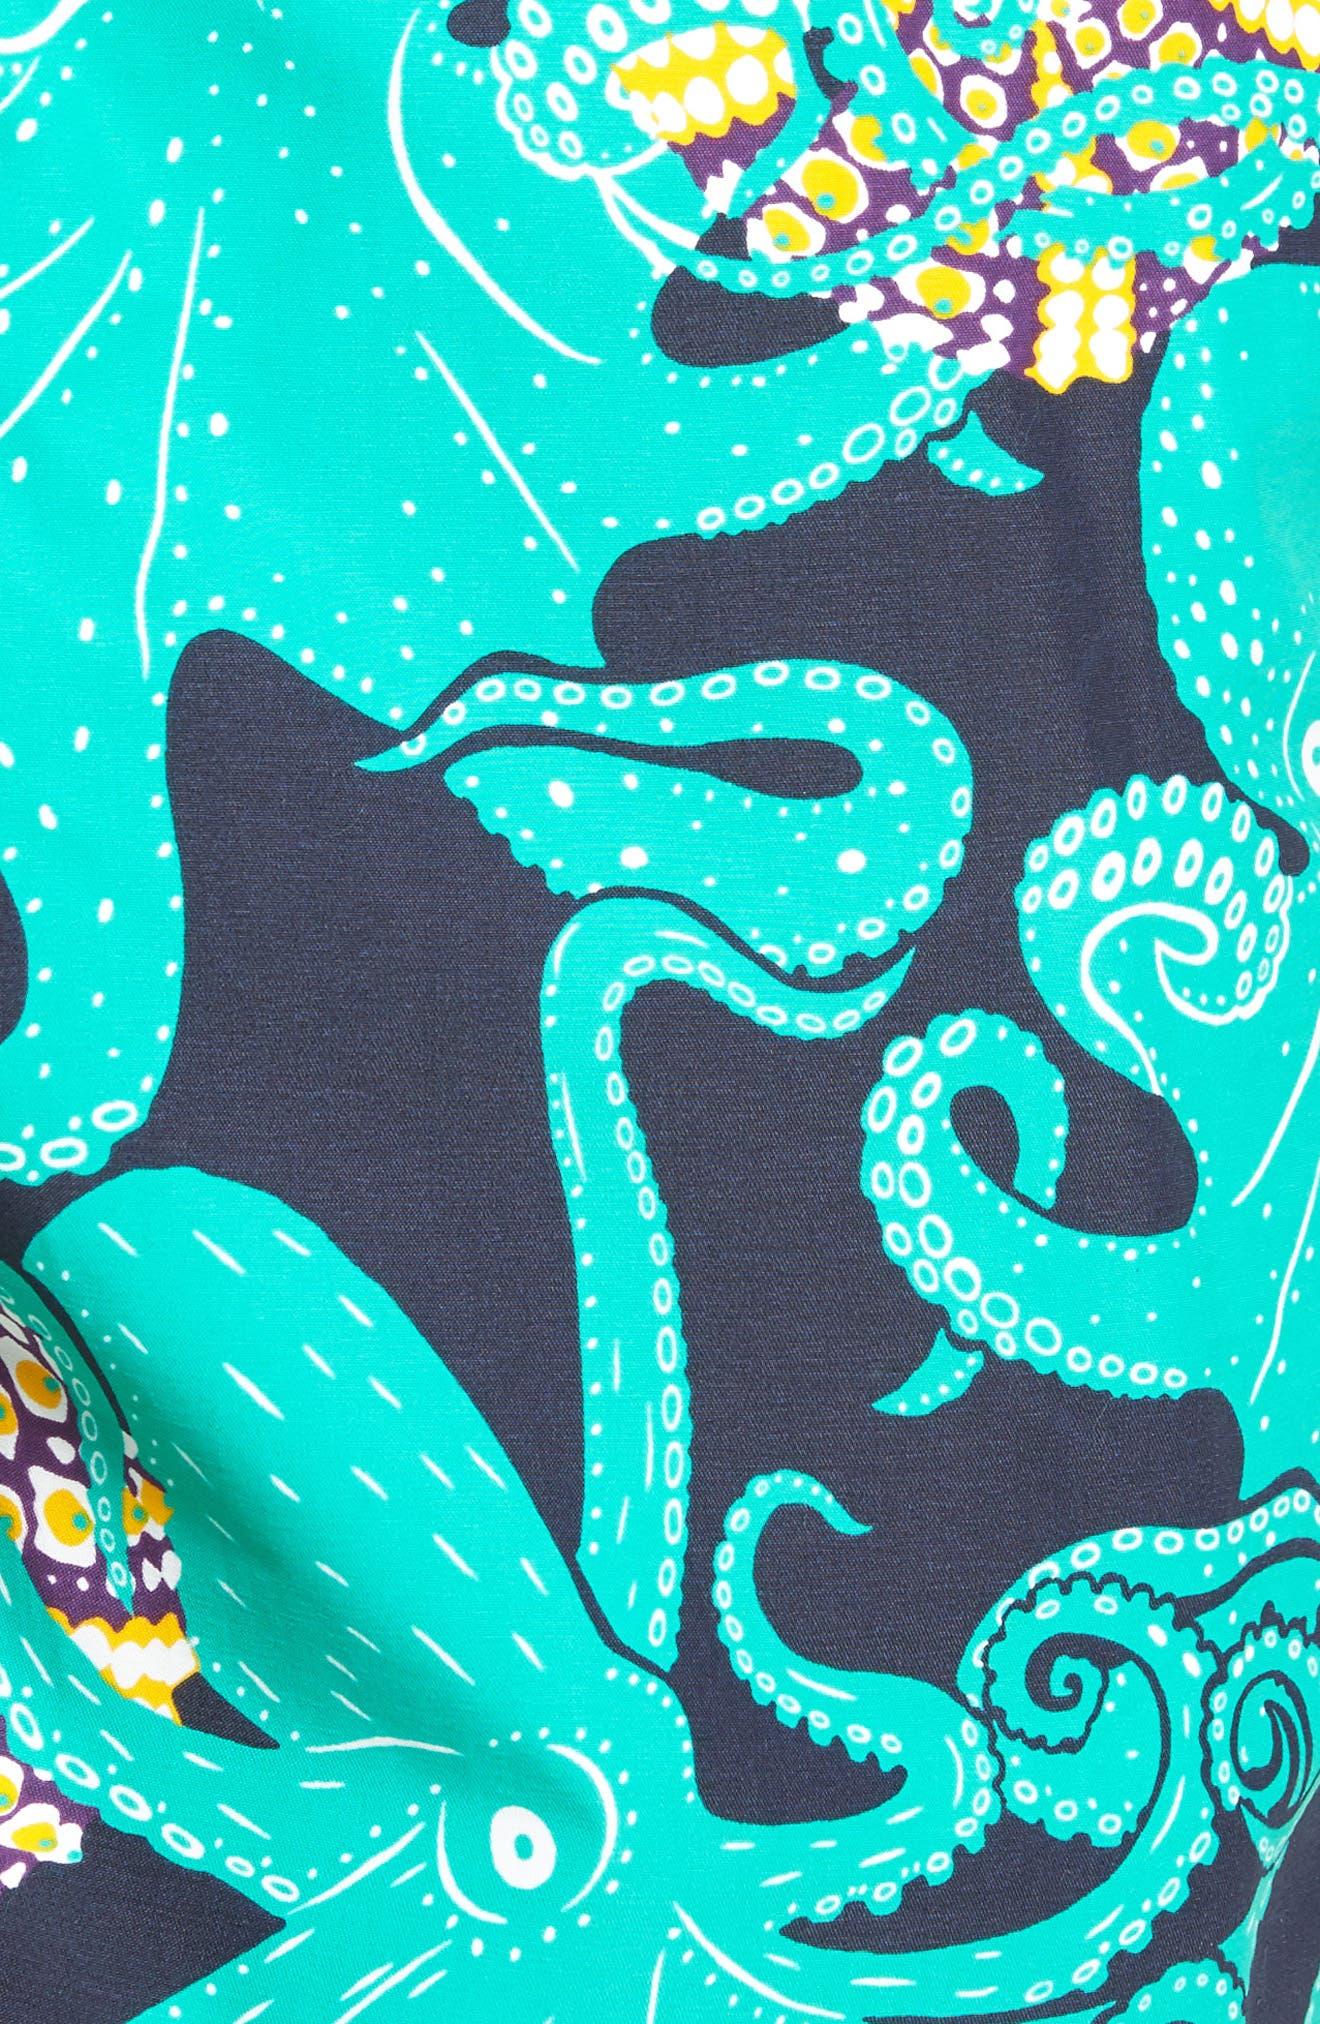 Octopus & Coral Swim Trunks,                             Alternate thumbnail 5, color,                             401